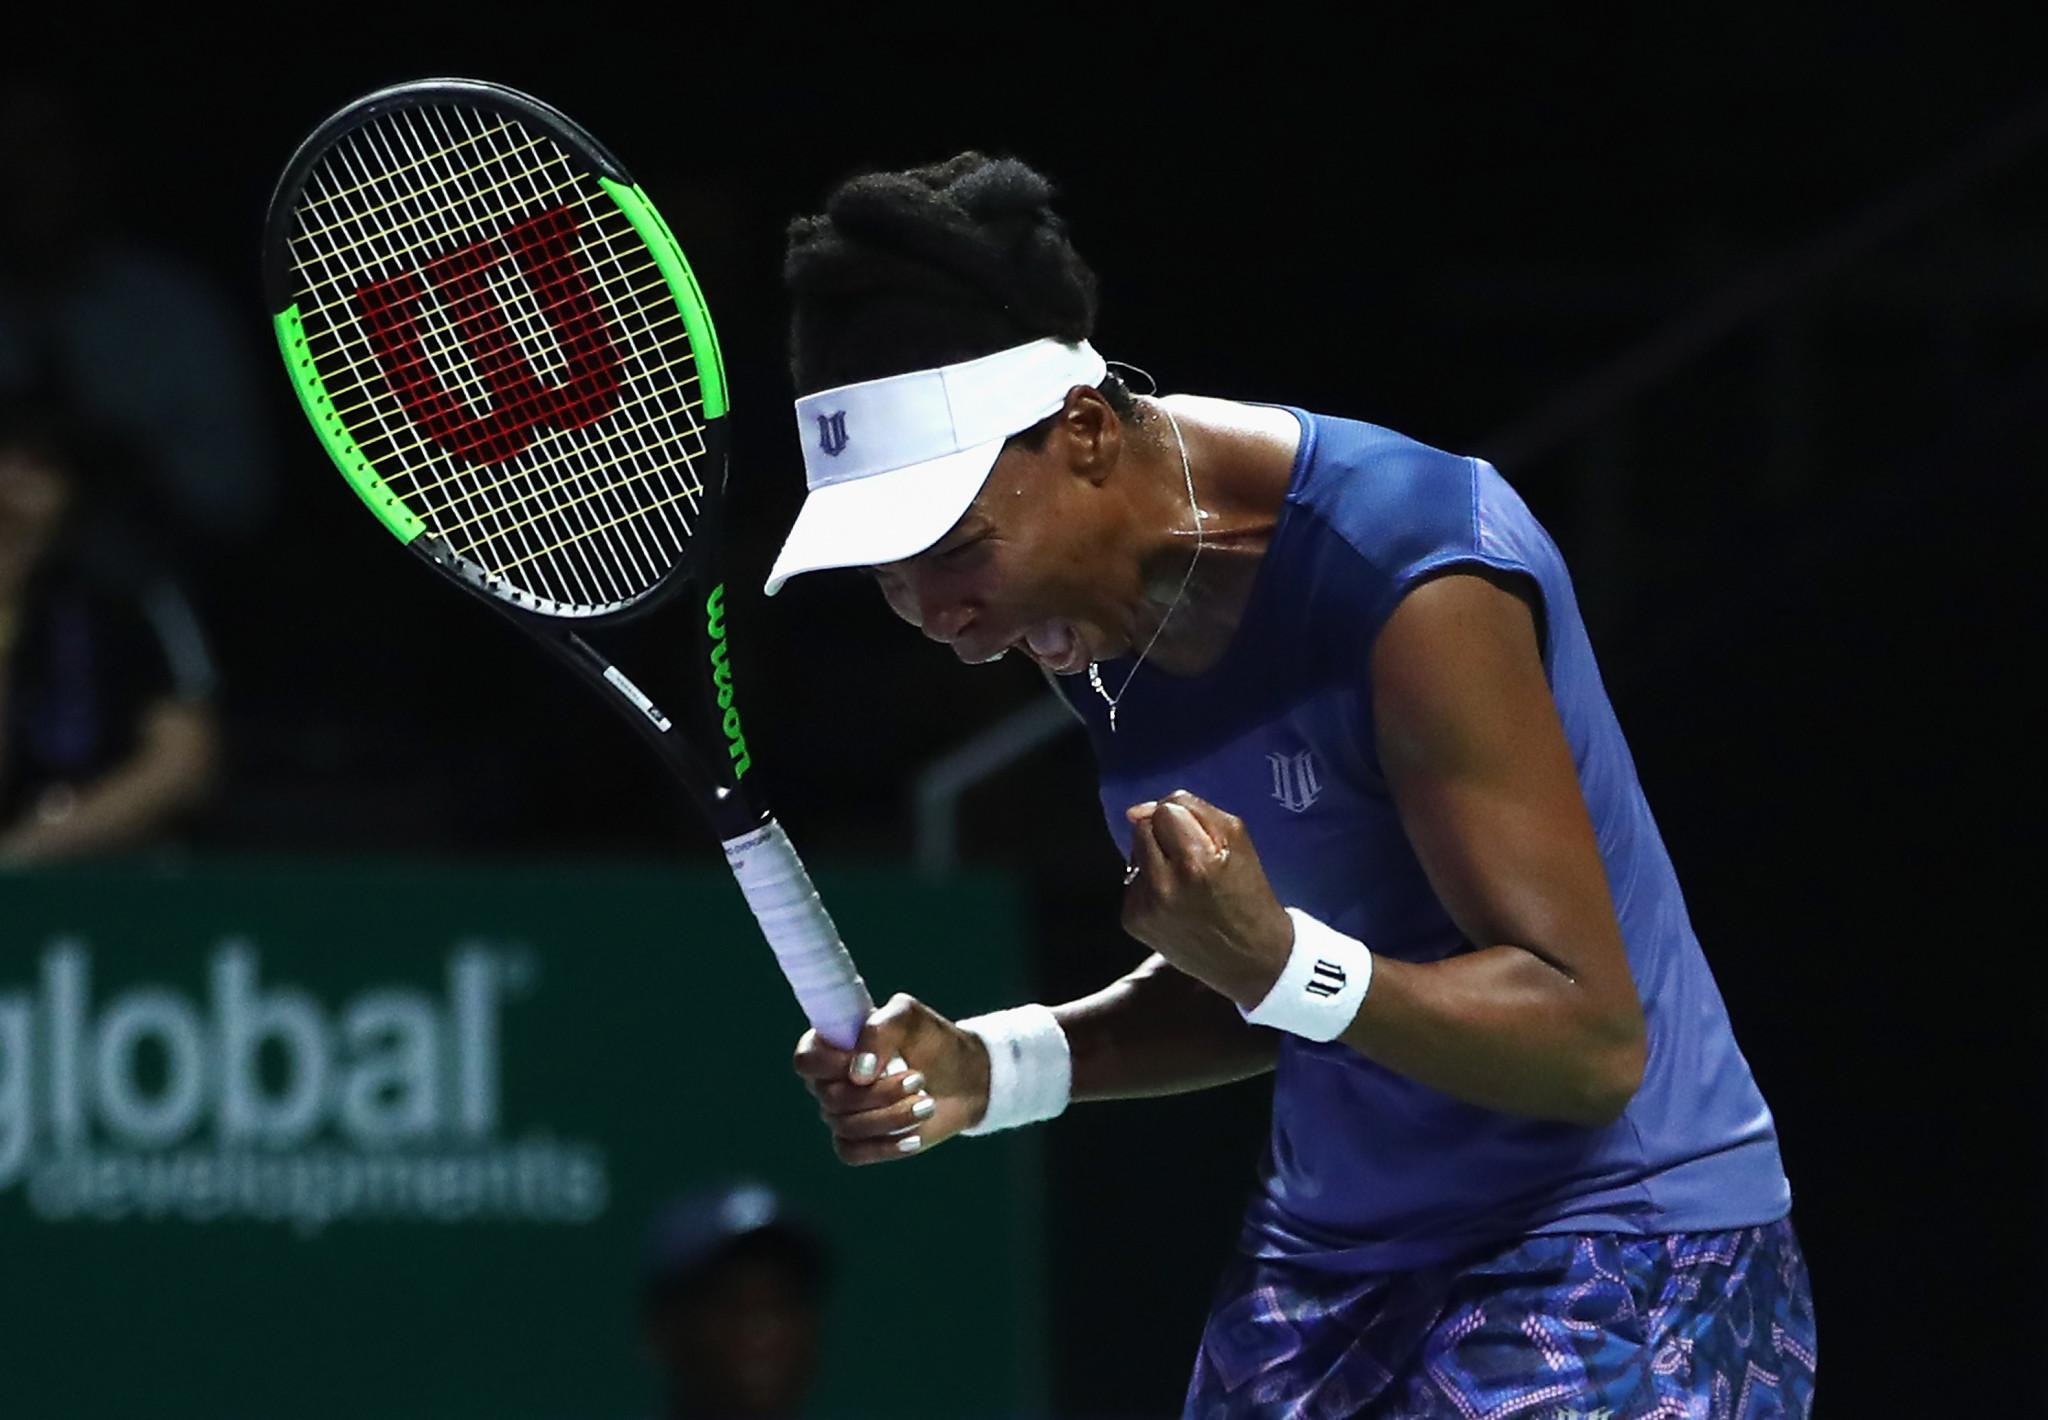 Williams beats Muguruza to reach last four at WTA Finals